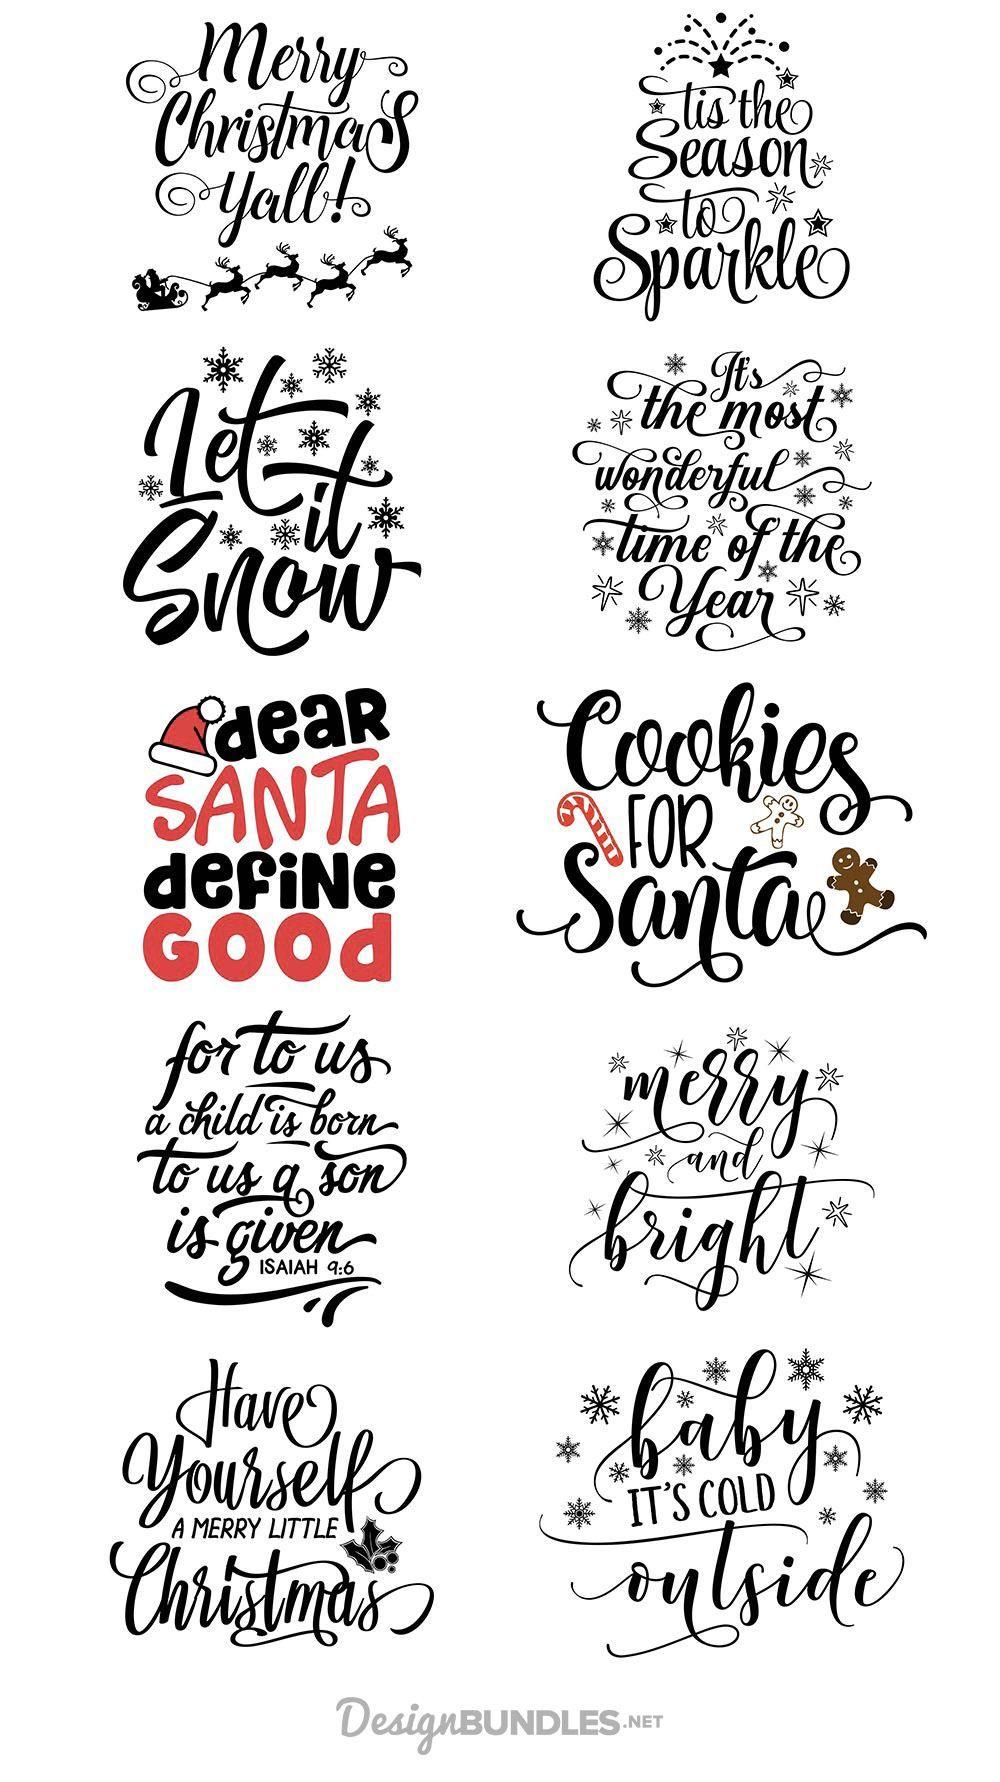 Download Free Christmas Quotes Design Bundle | Design quotes ...